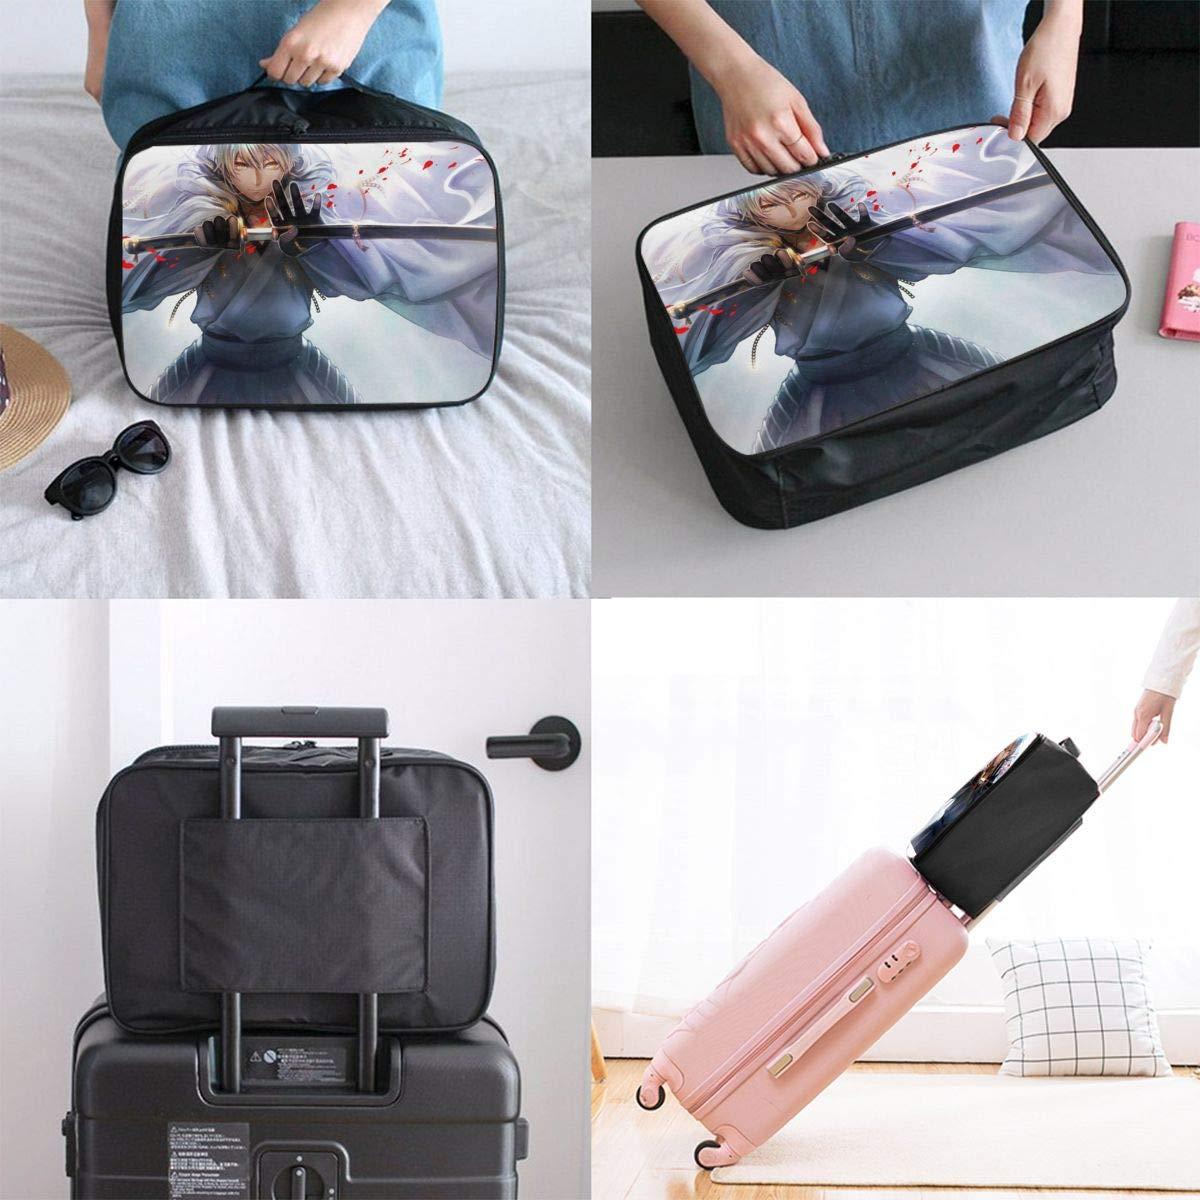 Touken Ranbu Customize Casual Portable Travel Bag Suitcase Storage Bag Luggage Packing Tote Bag Trolley Bag